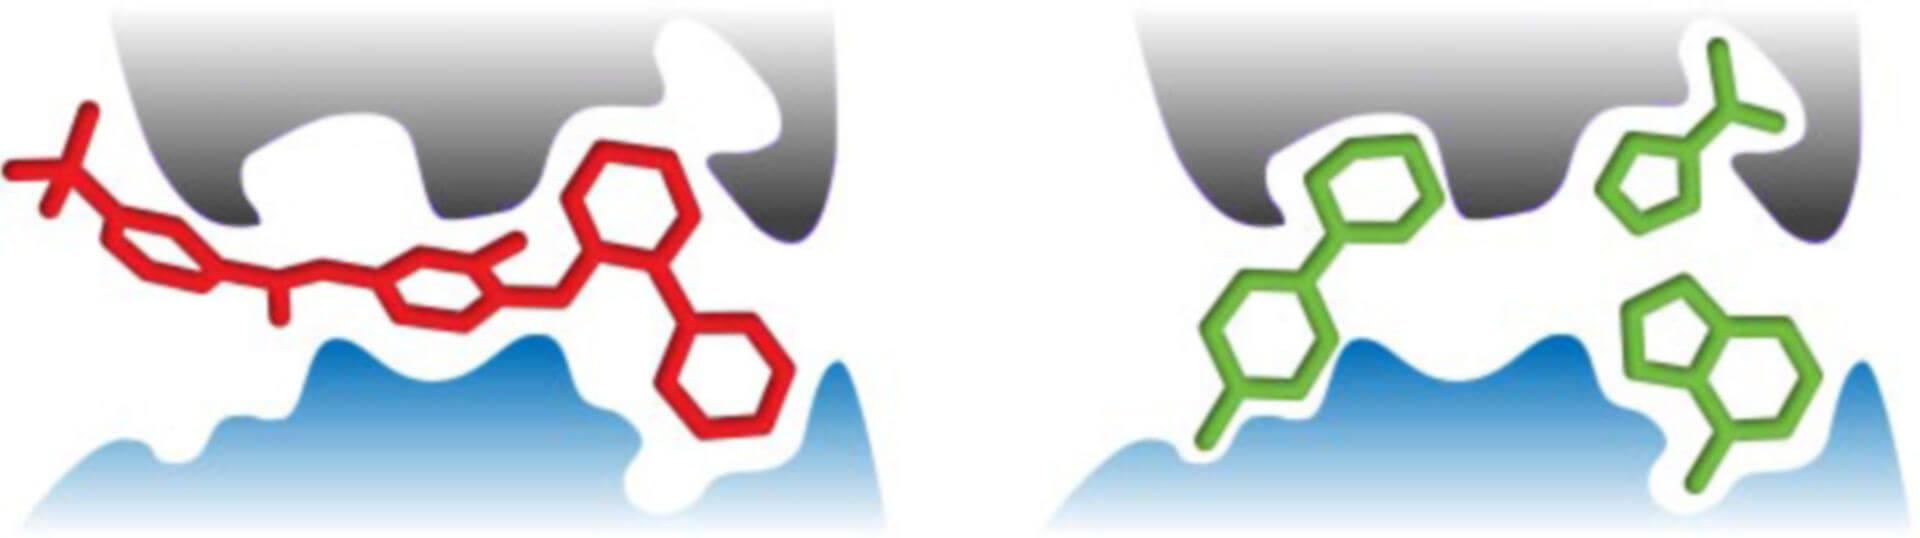 fragment based ligand screening